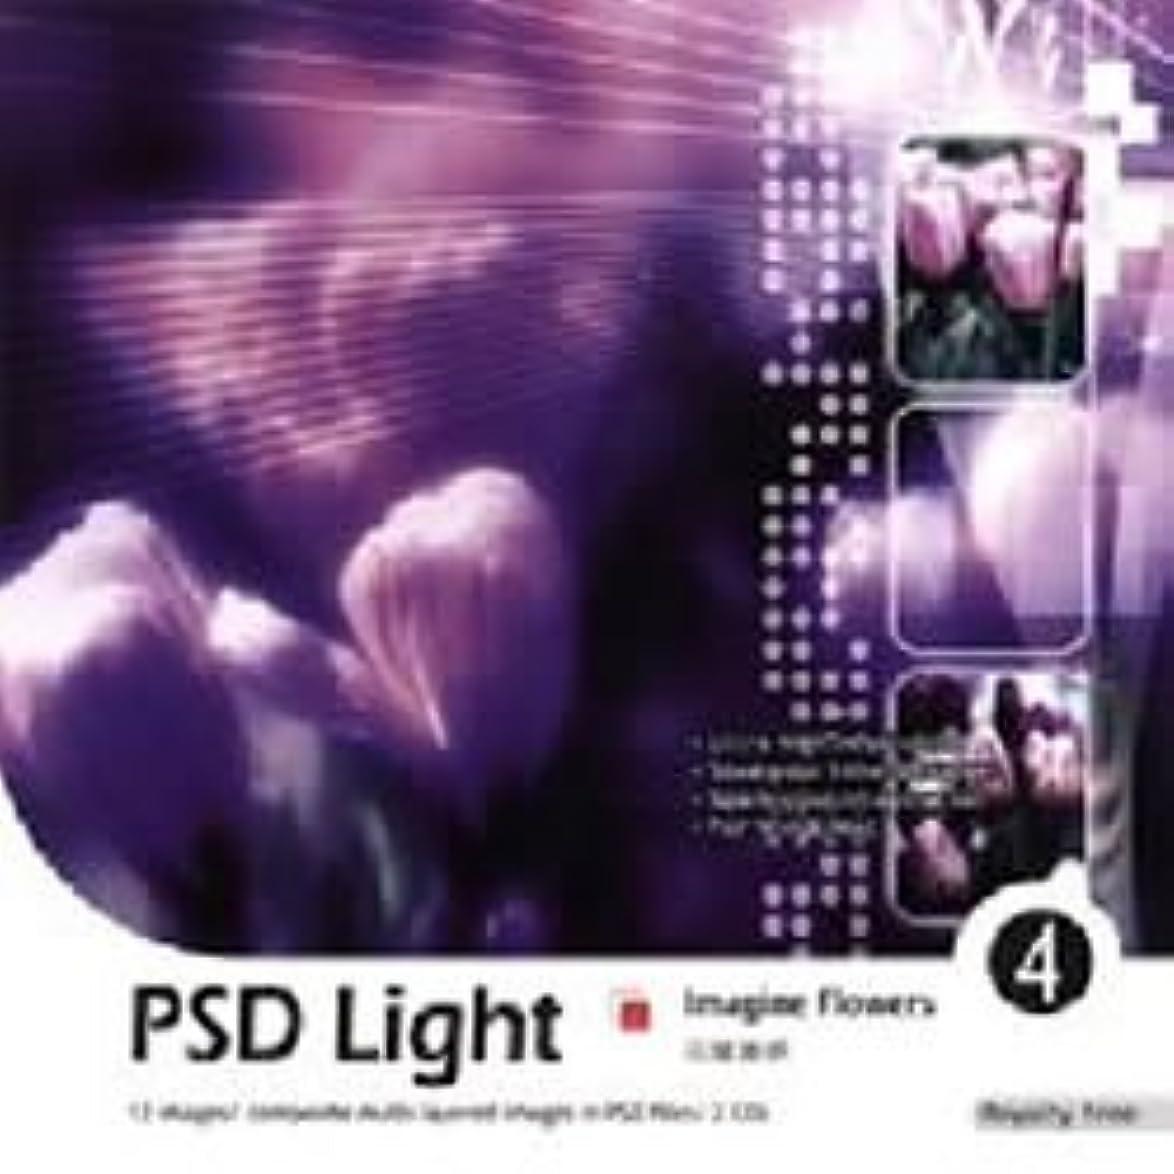 マグ式腕PSD Light Vol.4 草花幻想